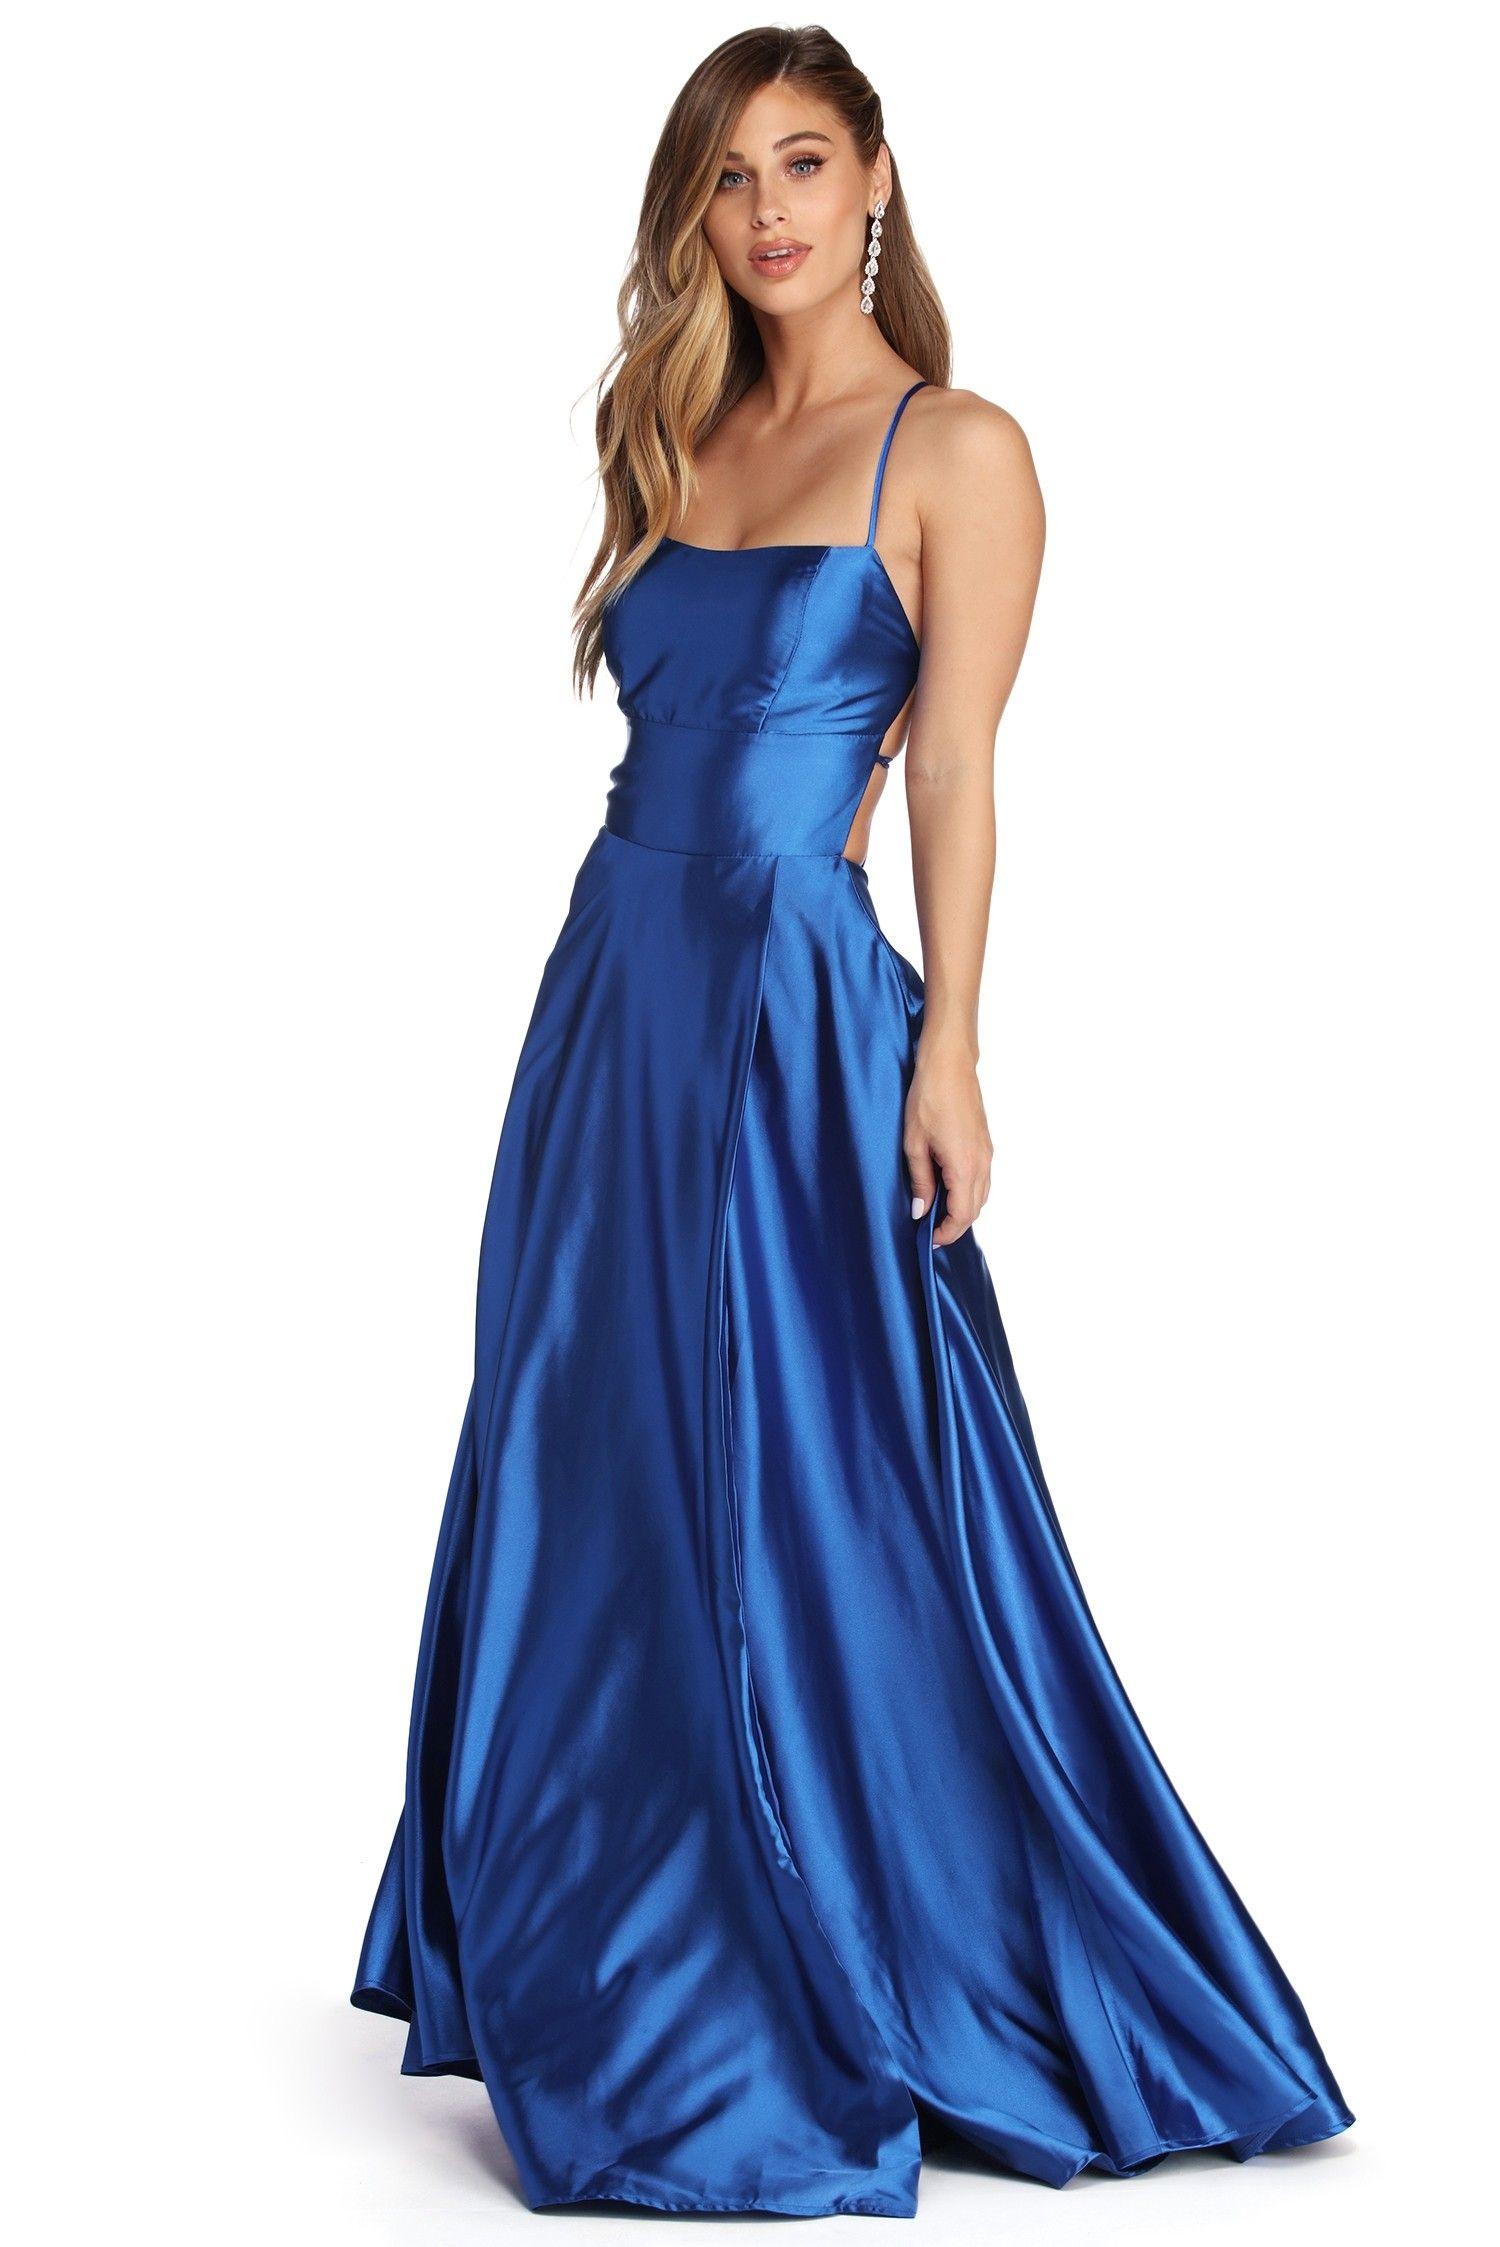 Anne formal lattice satin dress sequin formal dress